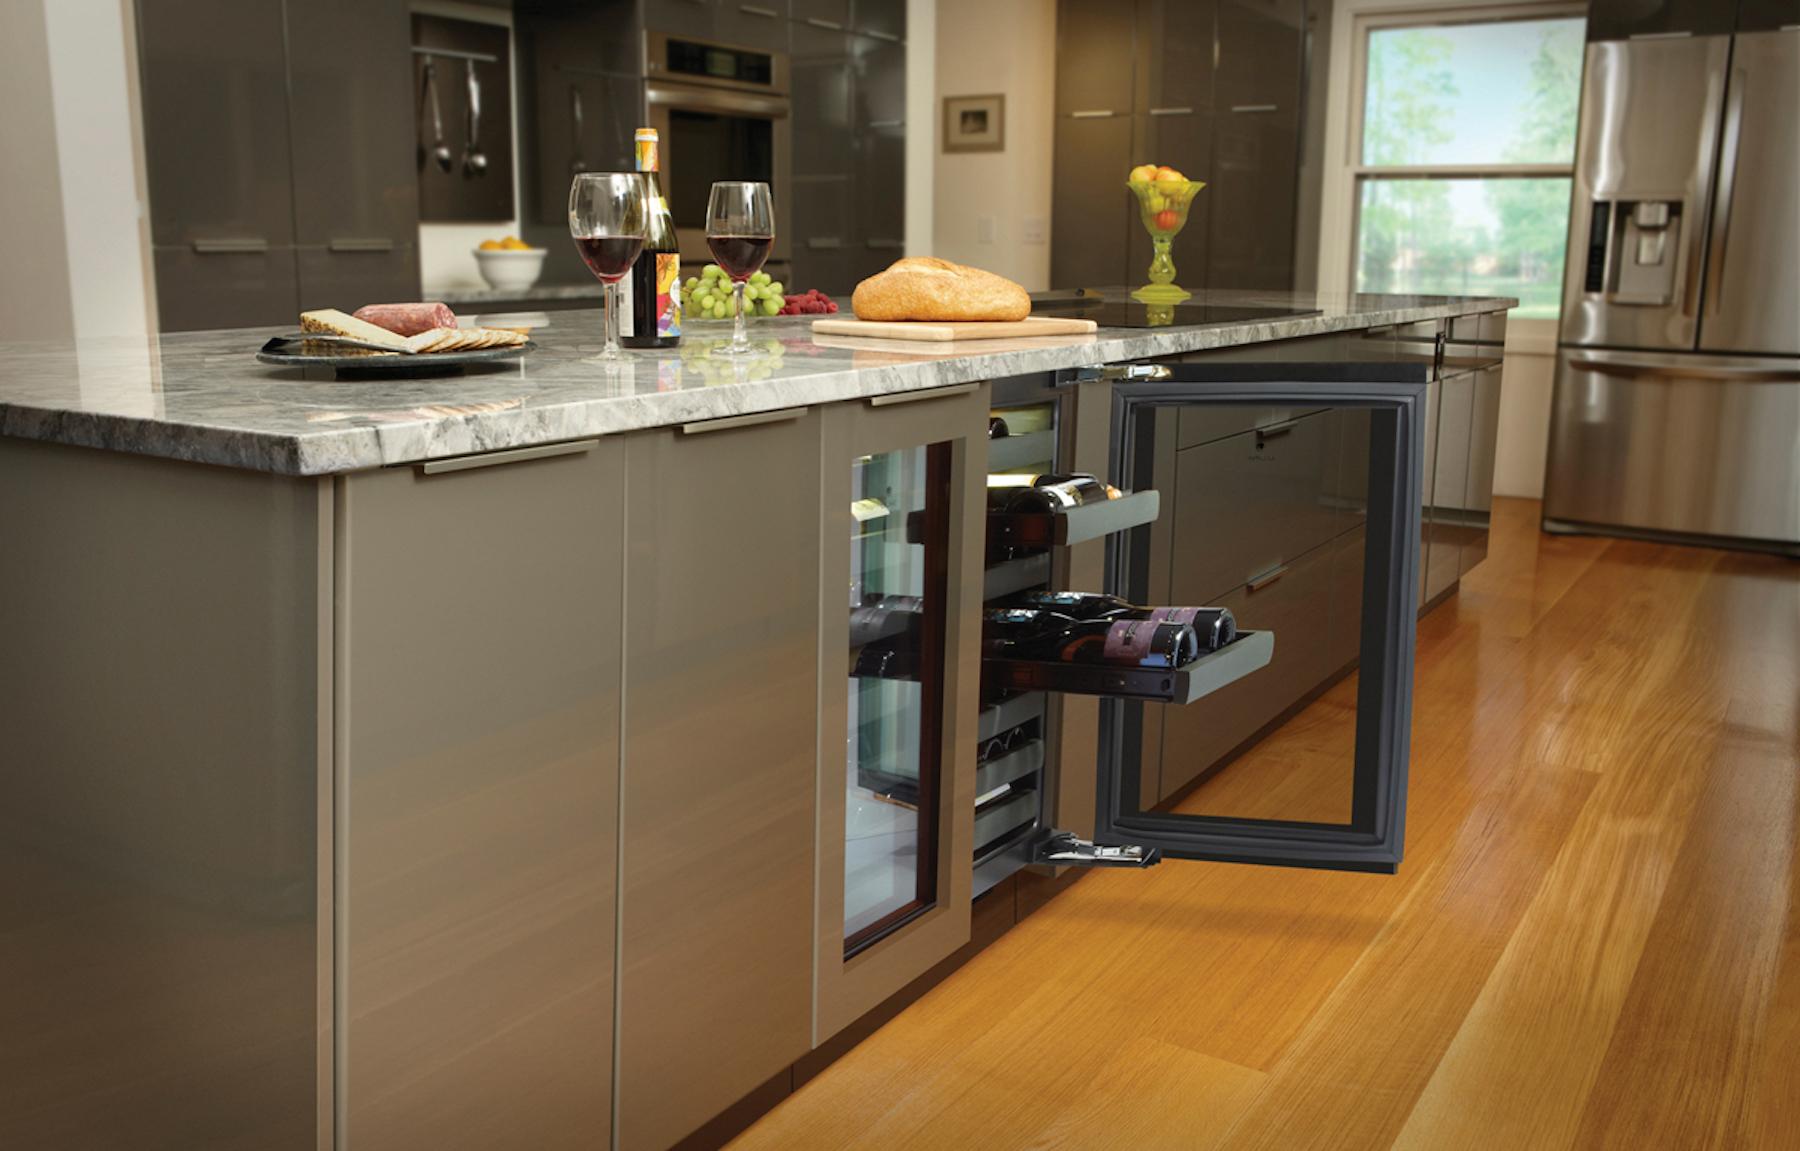 Courtenay appliances the upper vancouver island luxury - Upscale kitchen appliances ...